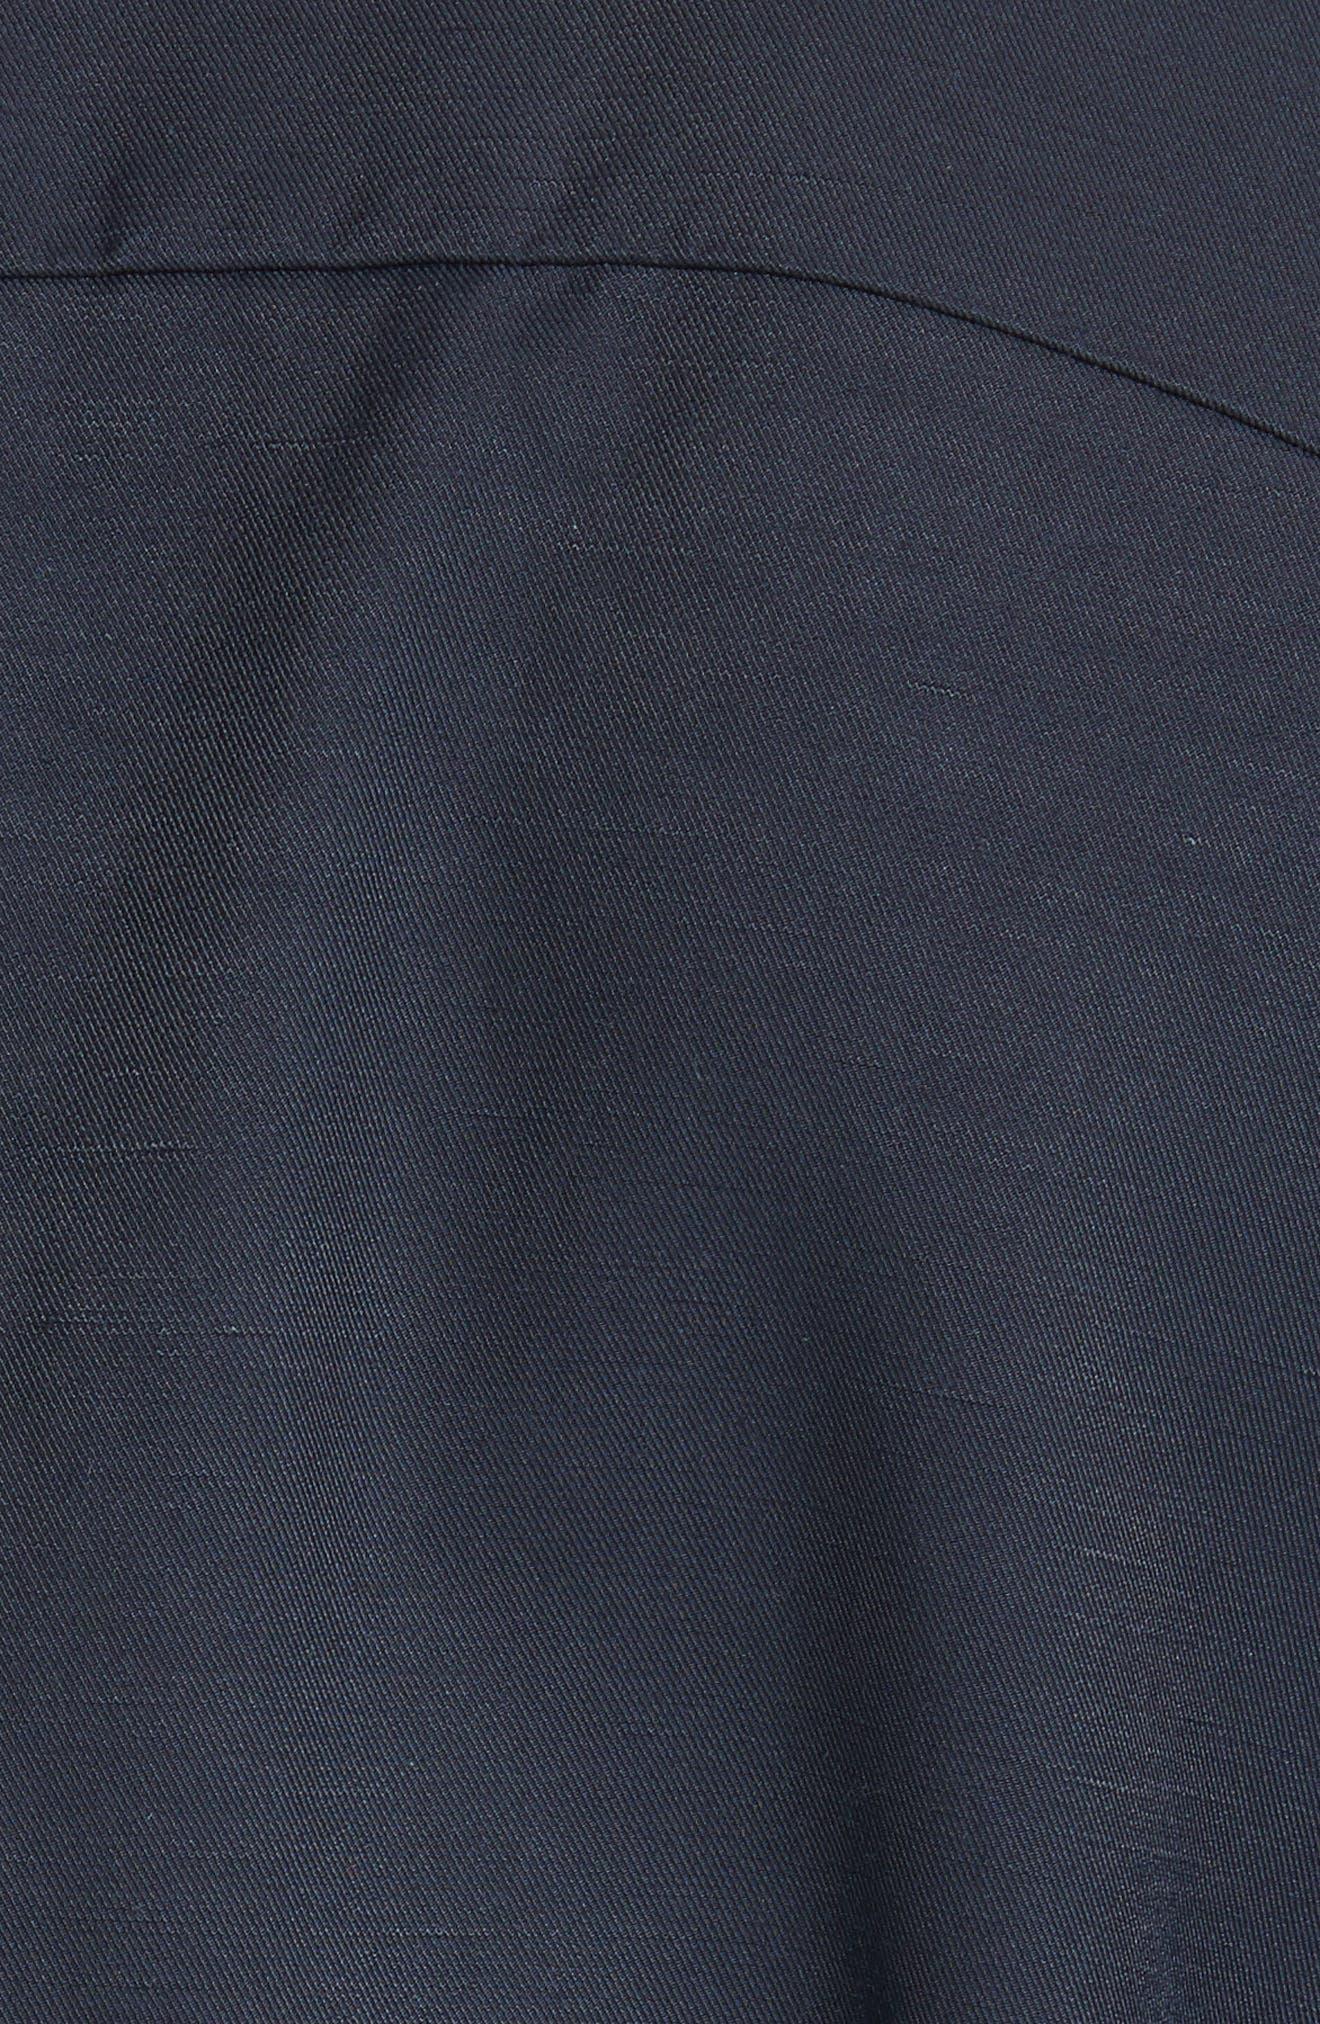 Plunging Cutout Maxi Dress,                             Alternate thumbnail 5, color,                             400